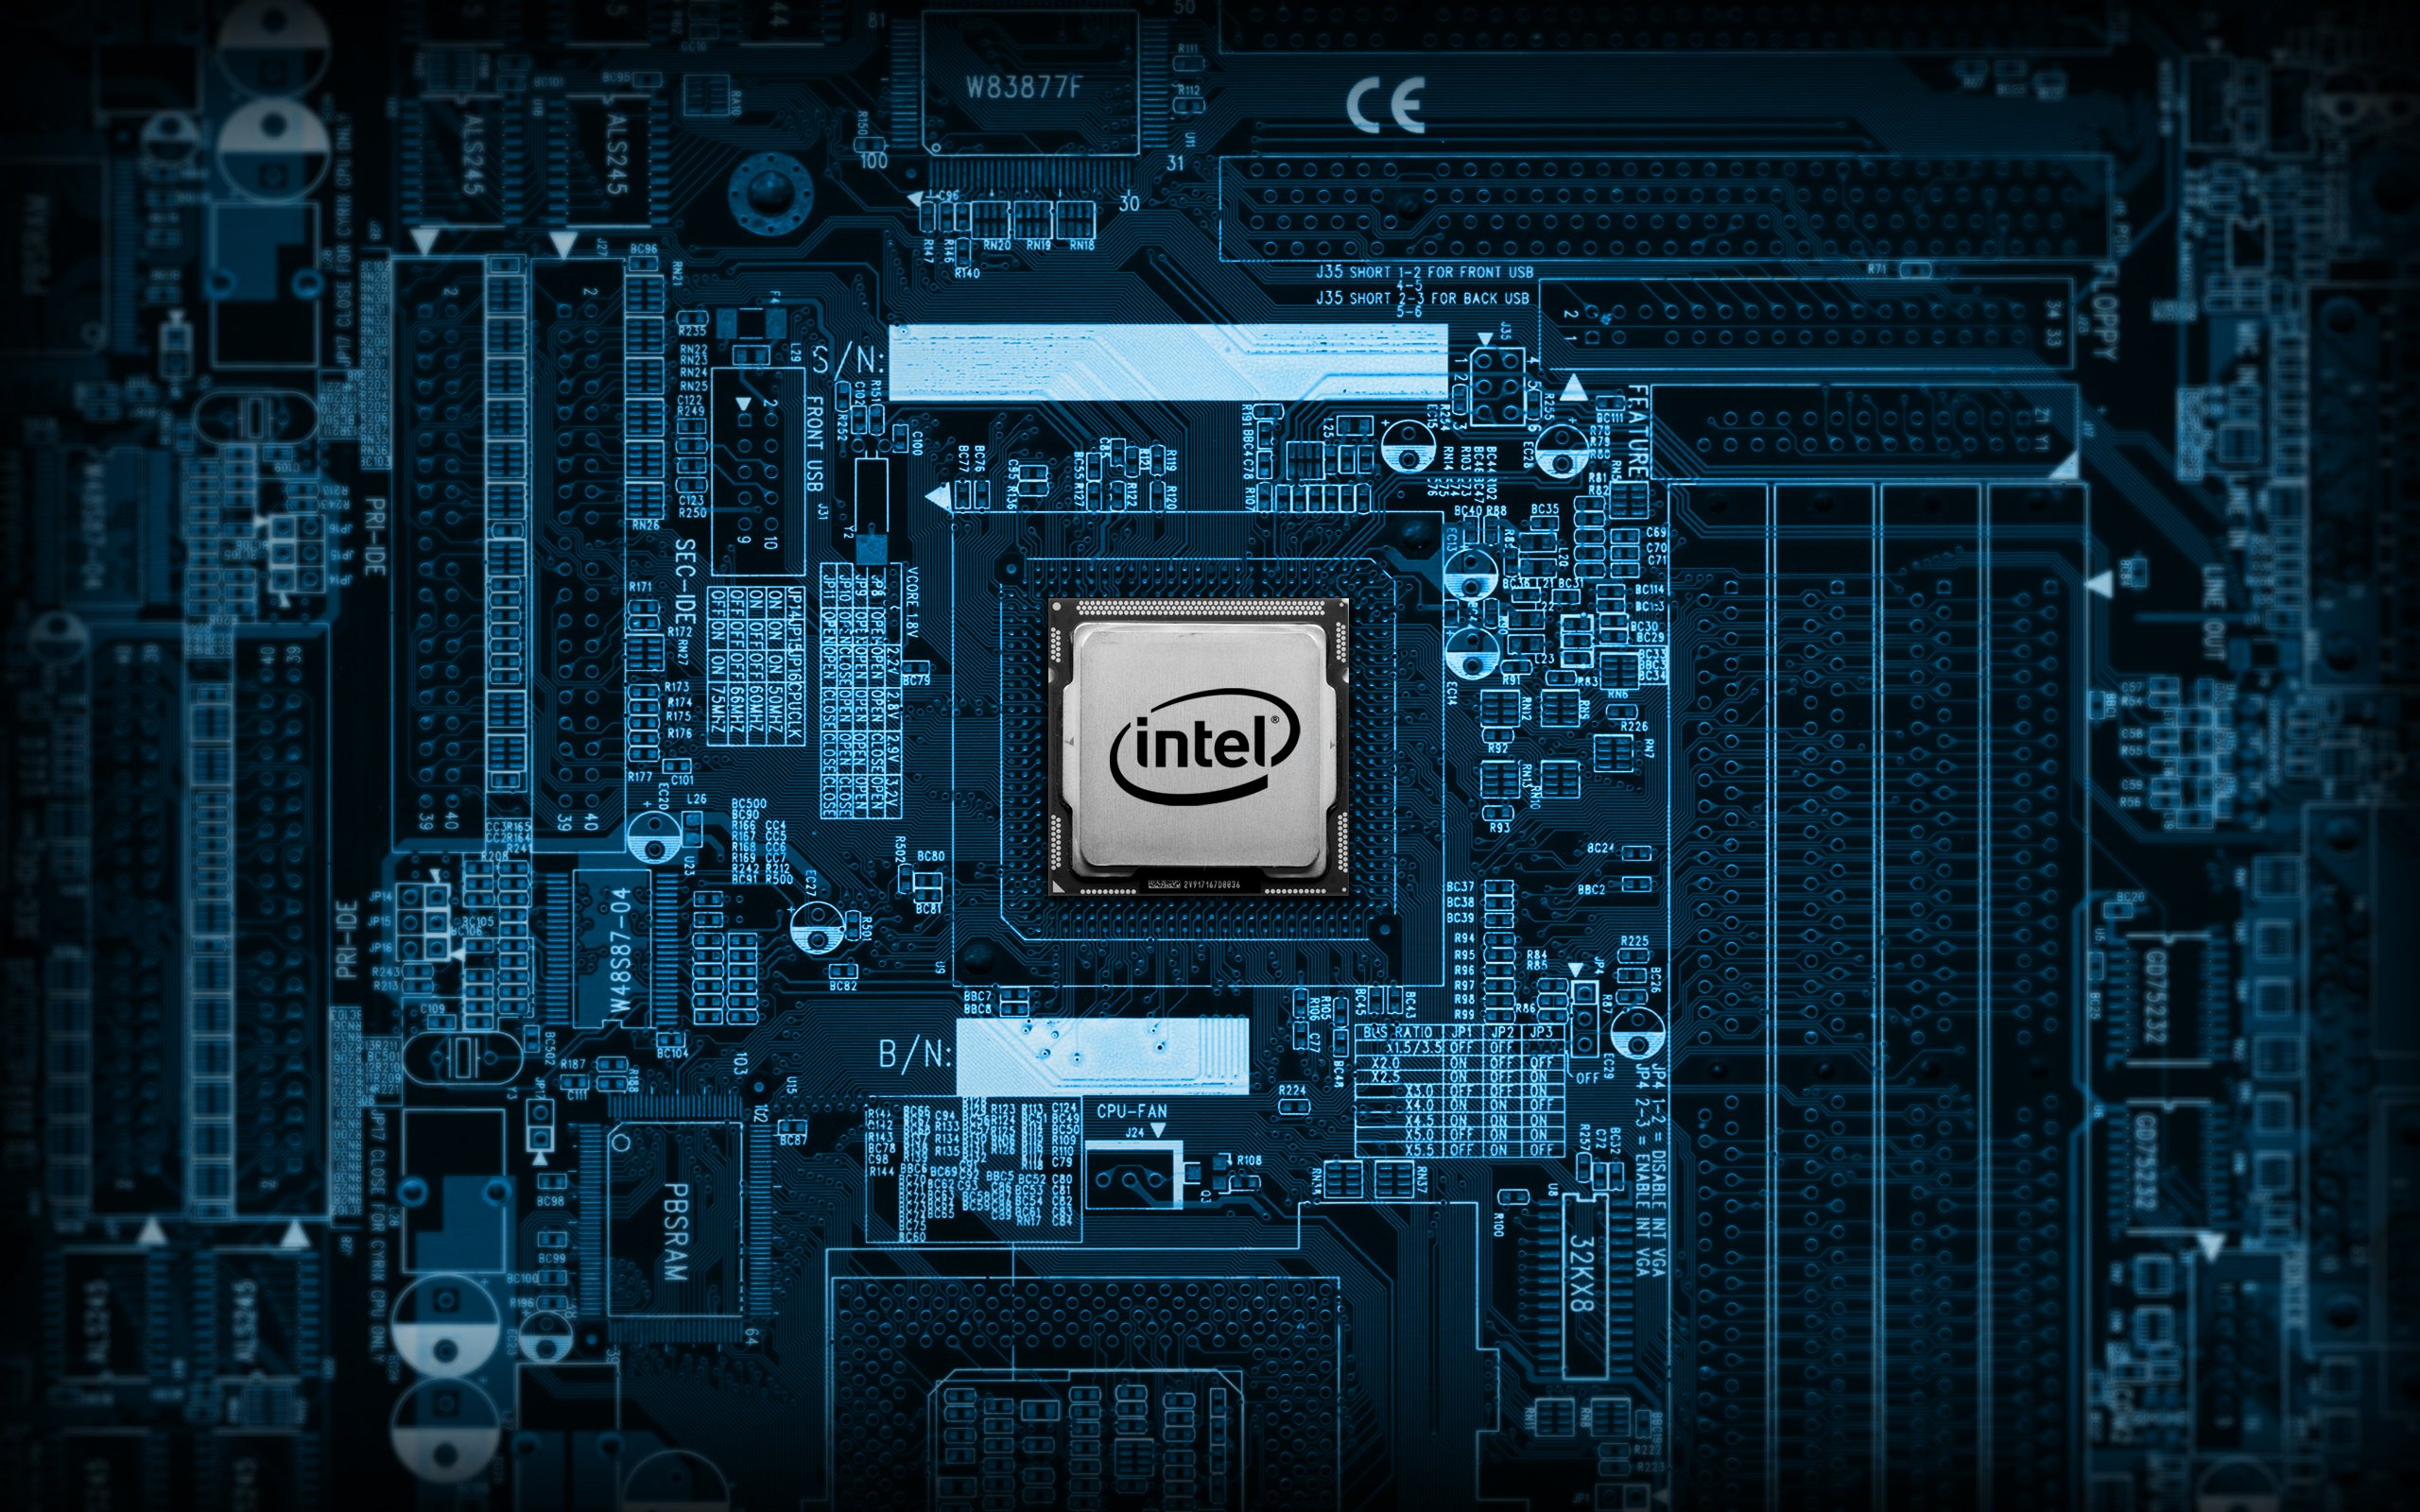 50+] 4K Intel Wallpaper on WallpaperSafari